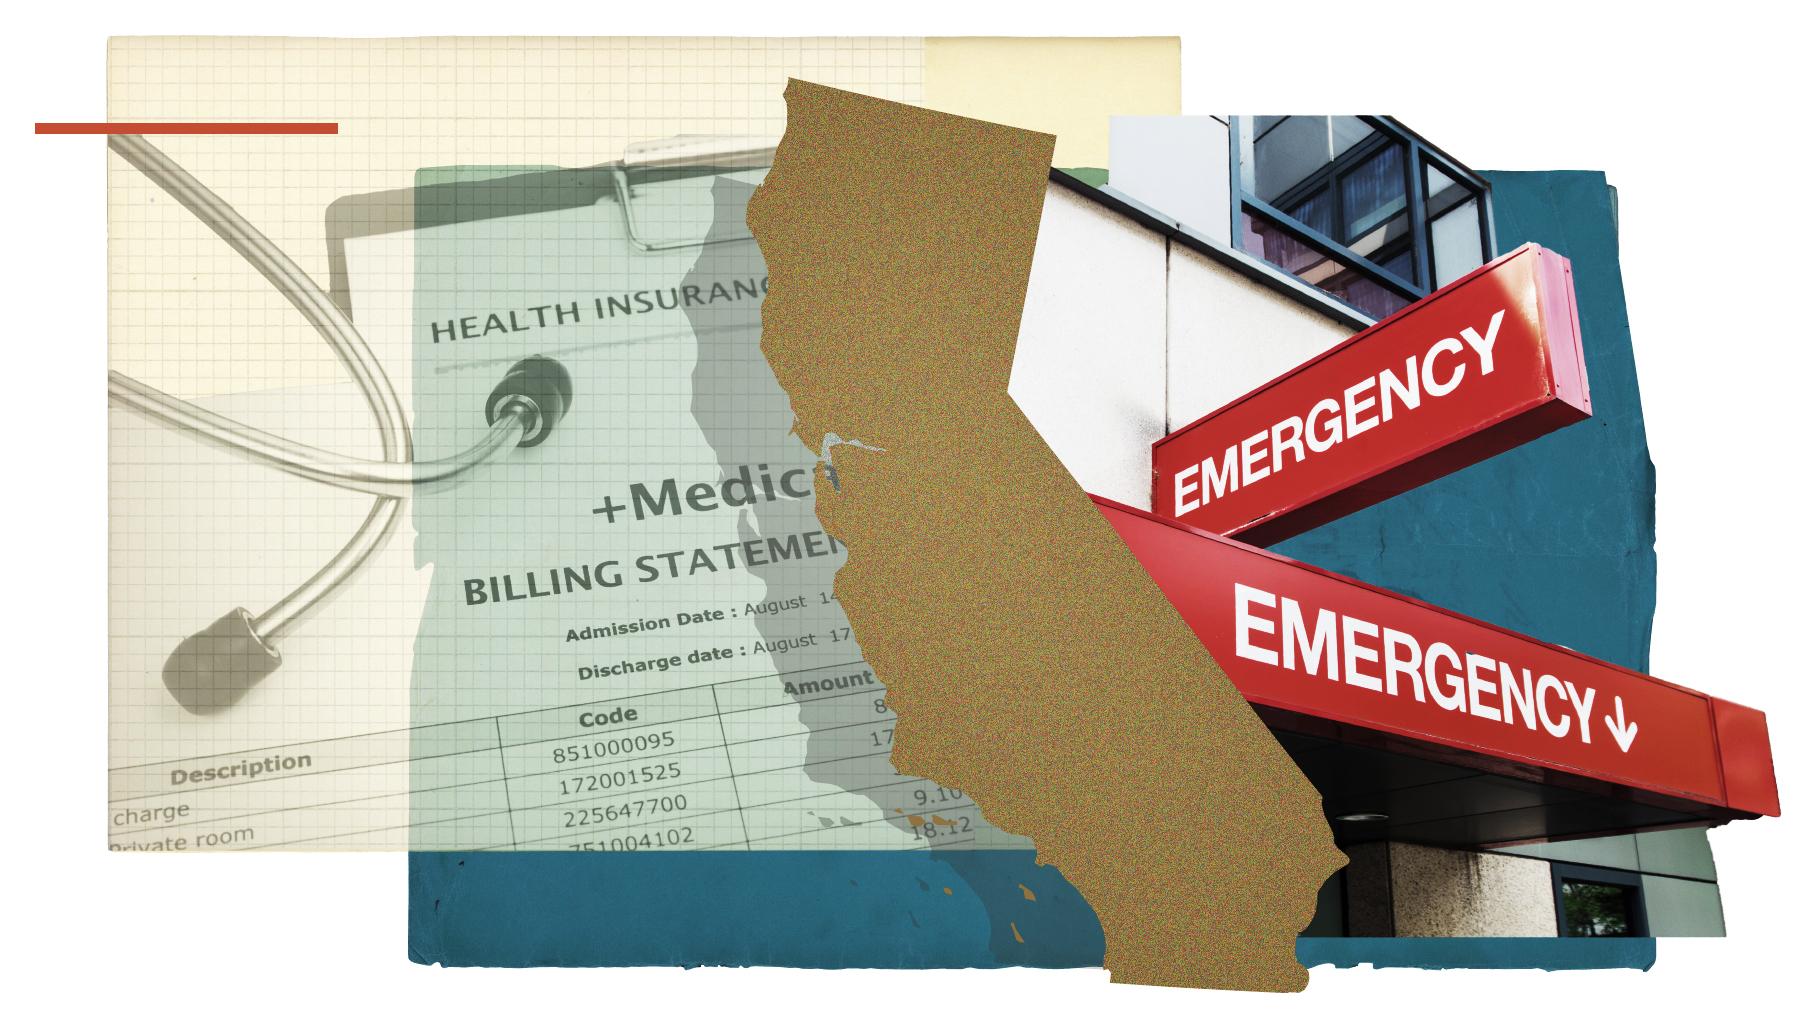 Bills and an emergency room hospital entrance.